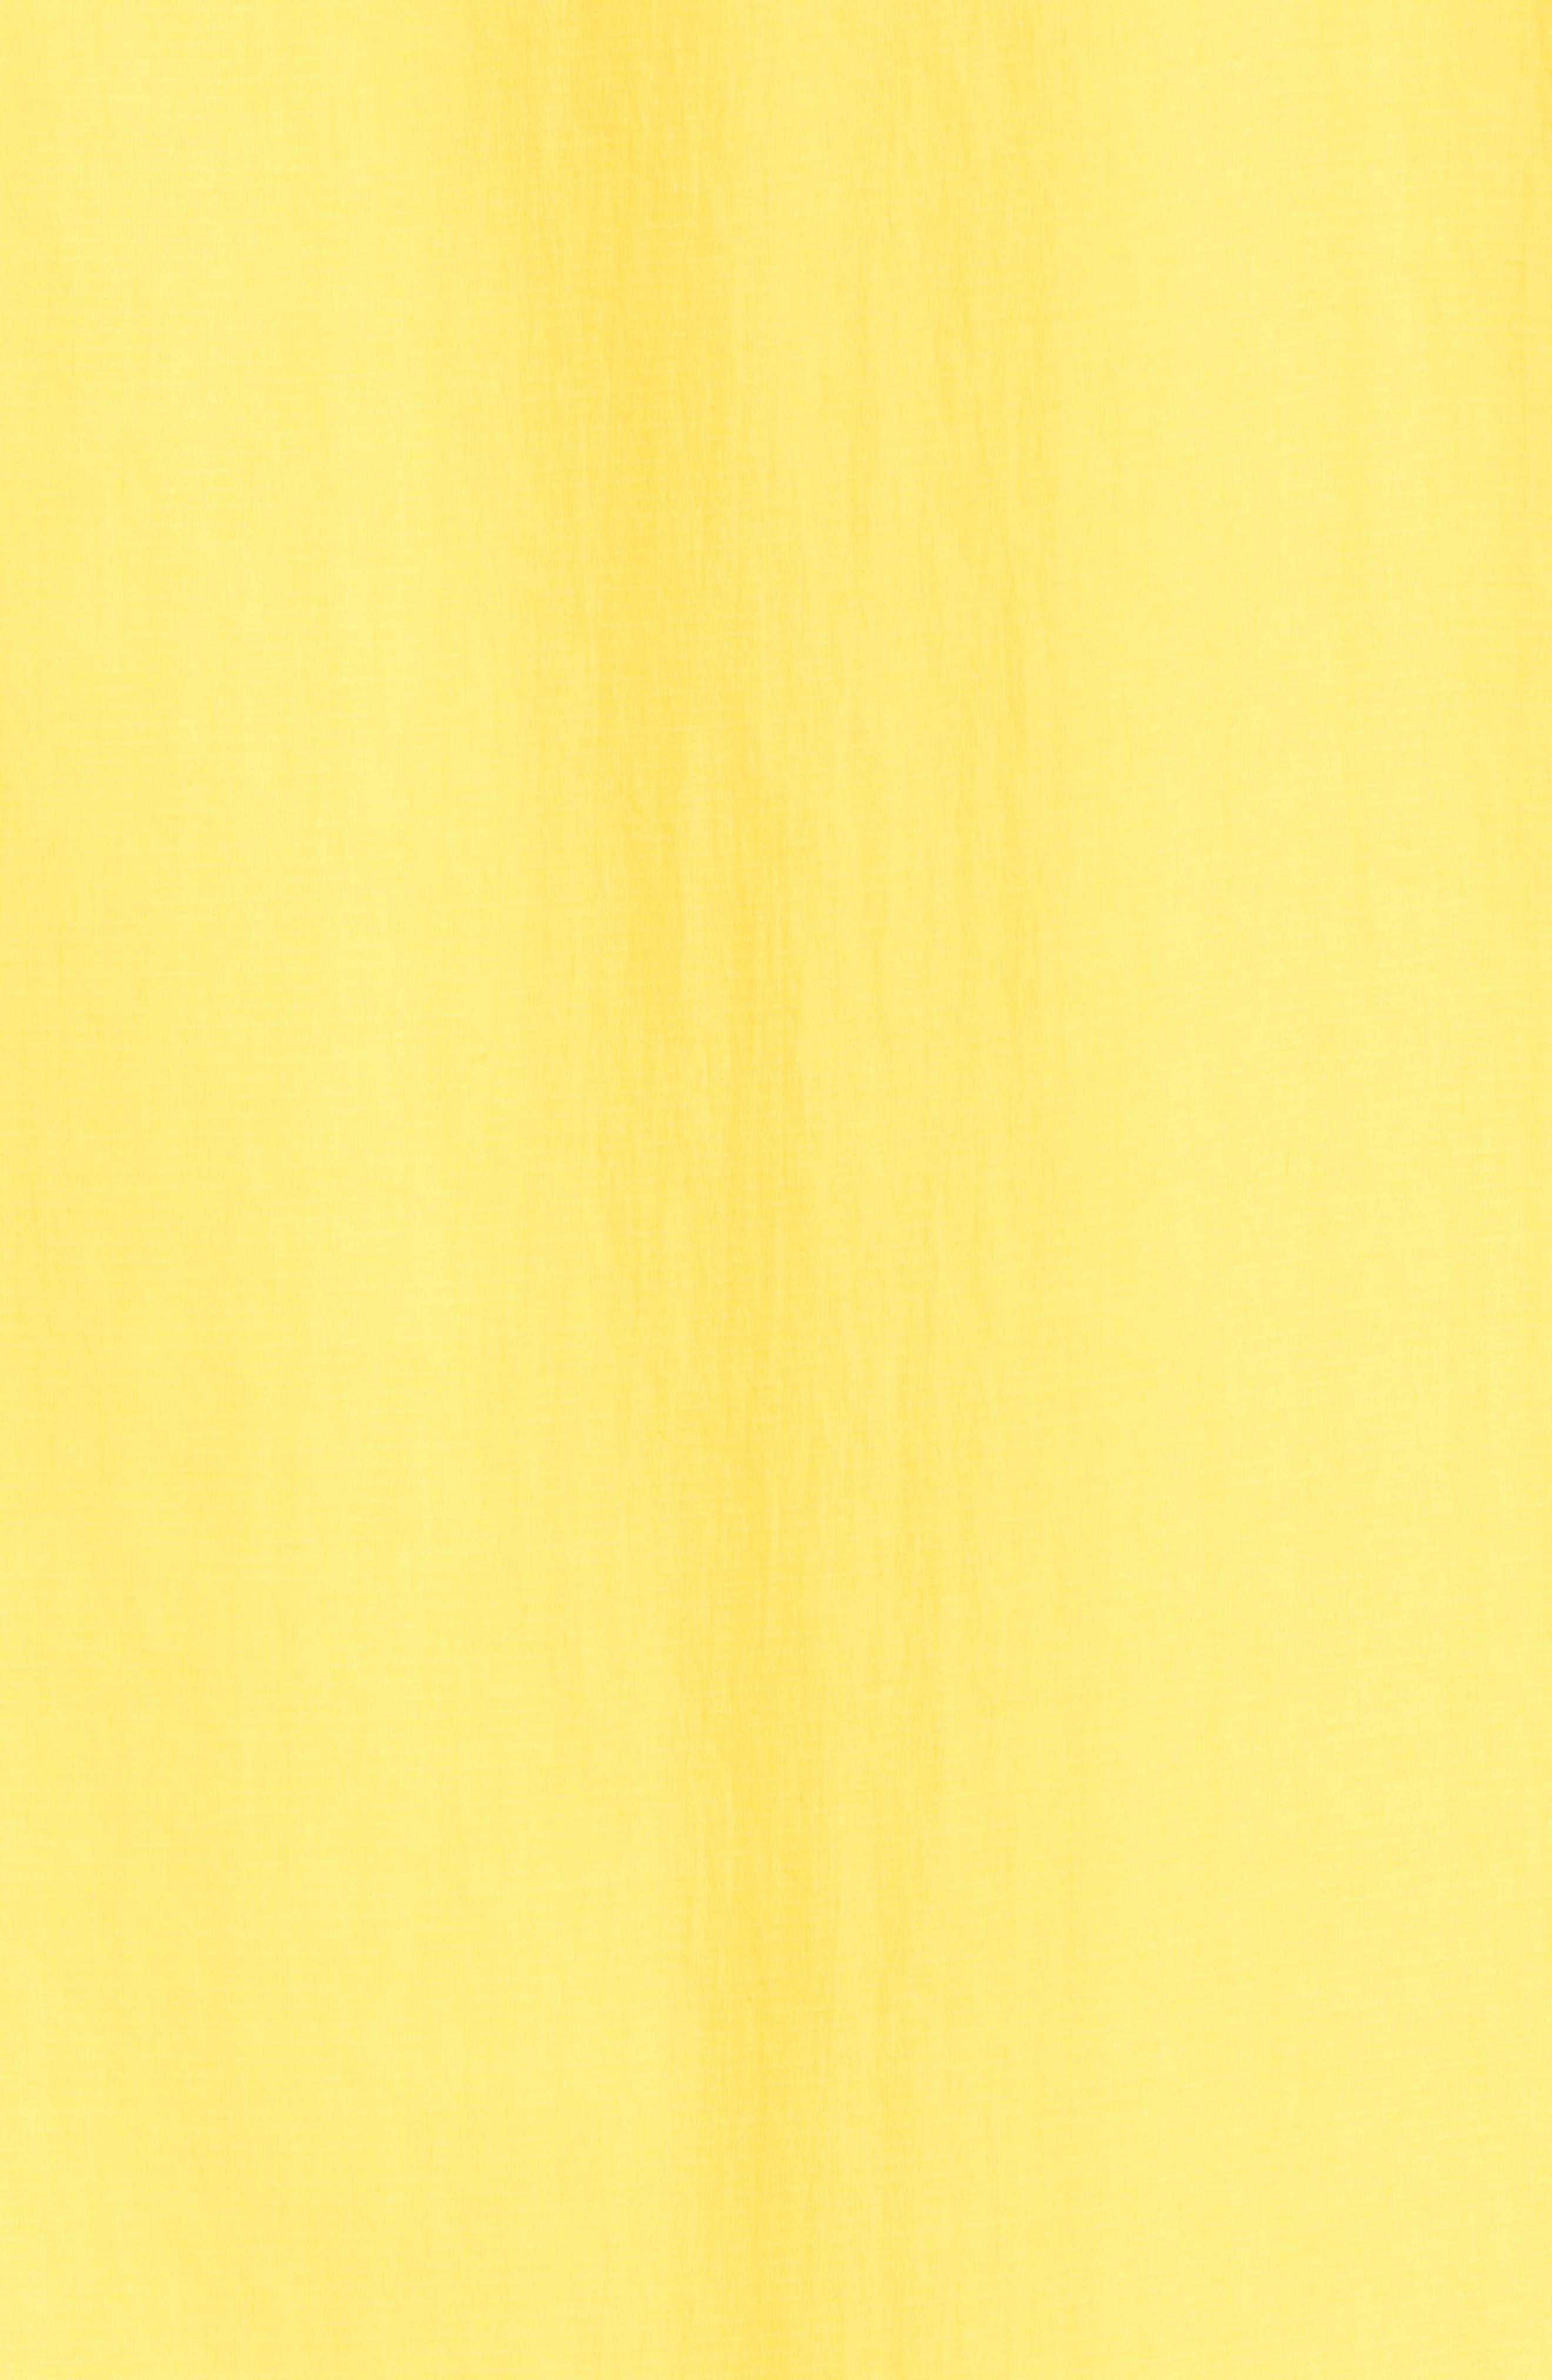 Windbreaker Anorak,                             Alternate thumbnail 7, color,                             GOLD FUSION/ LIMOGES